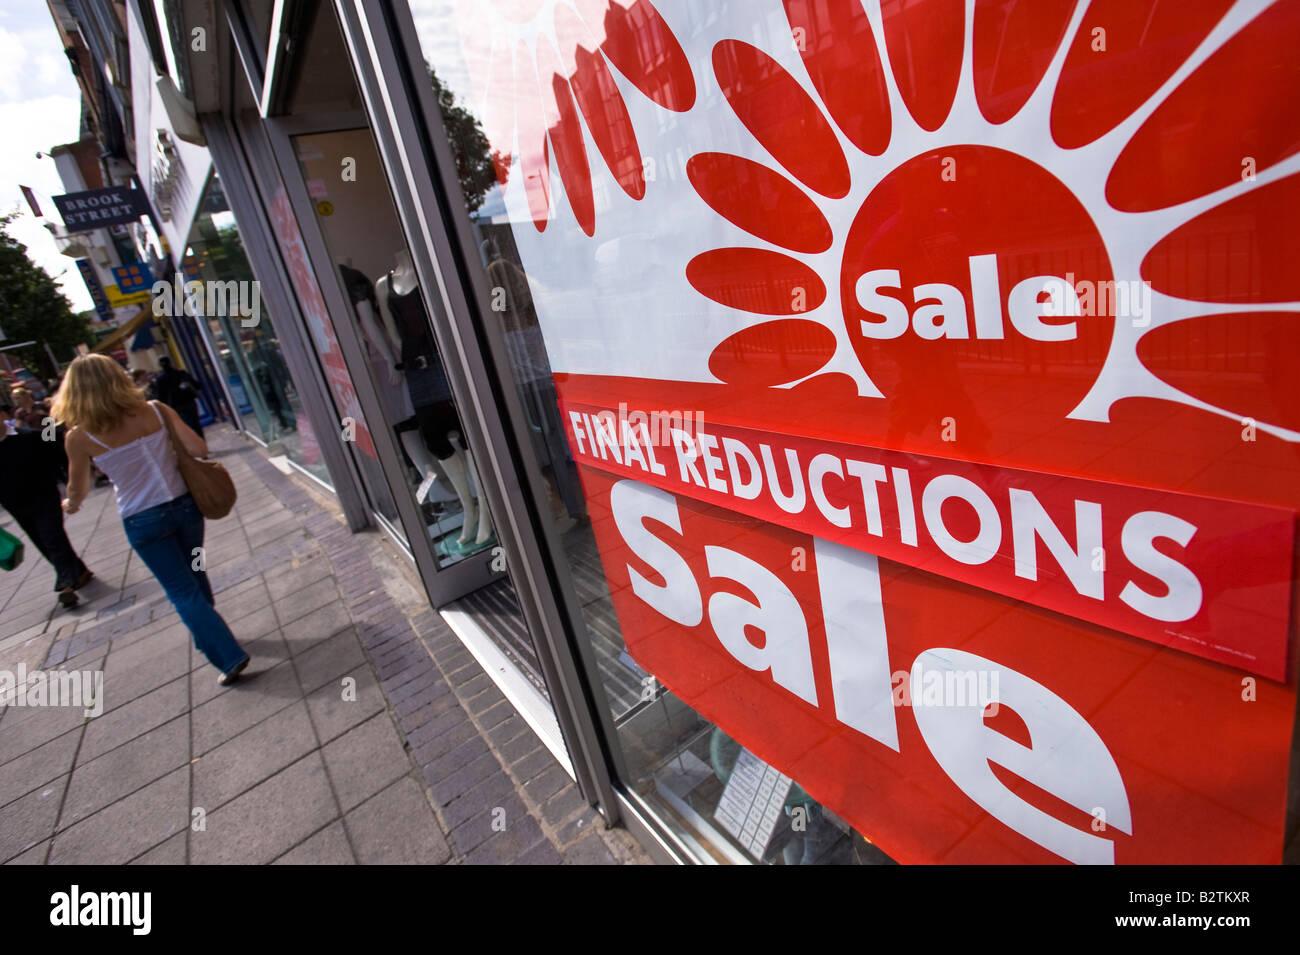 Sale sign in shop window W5 Ealing London United Kingdom - Stock Image